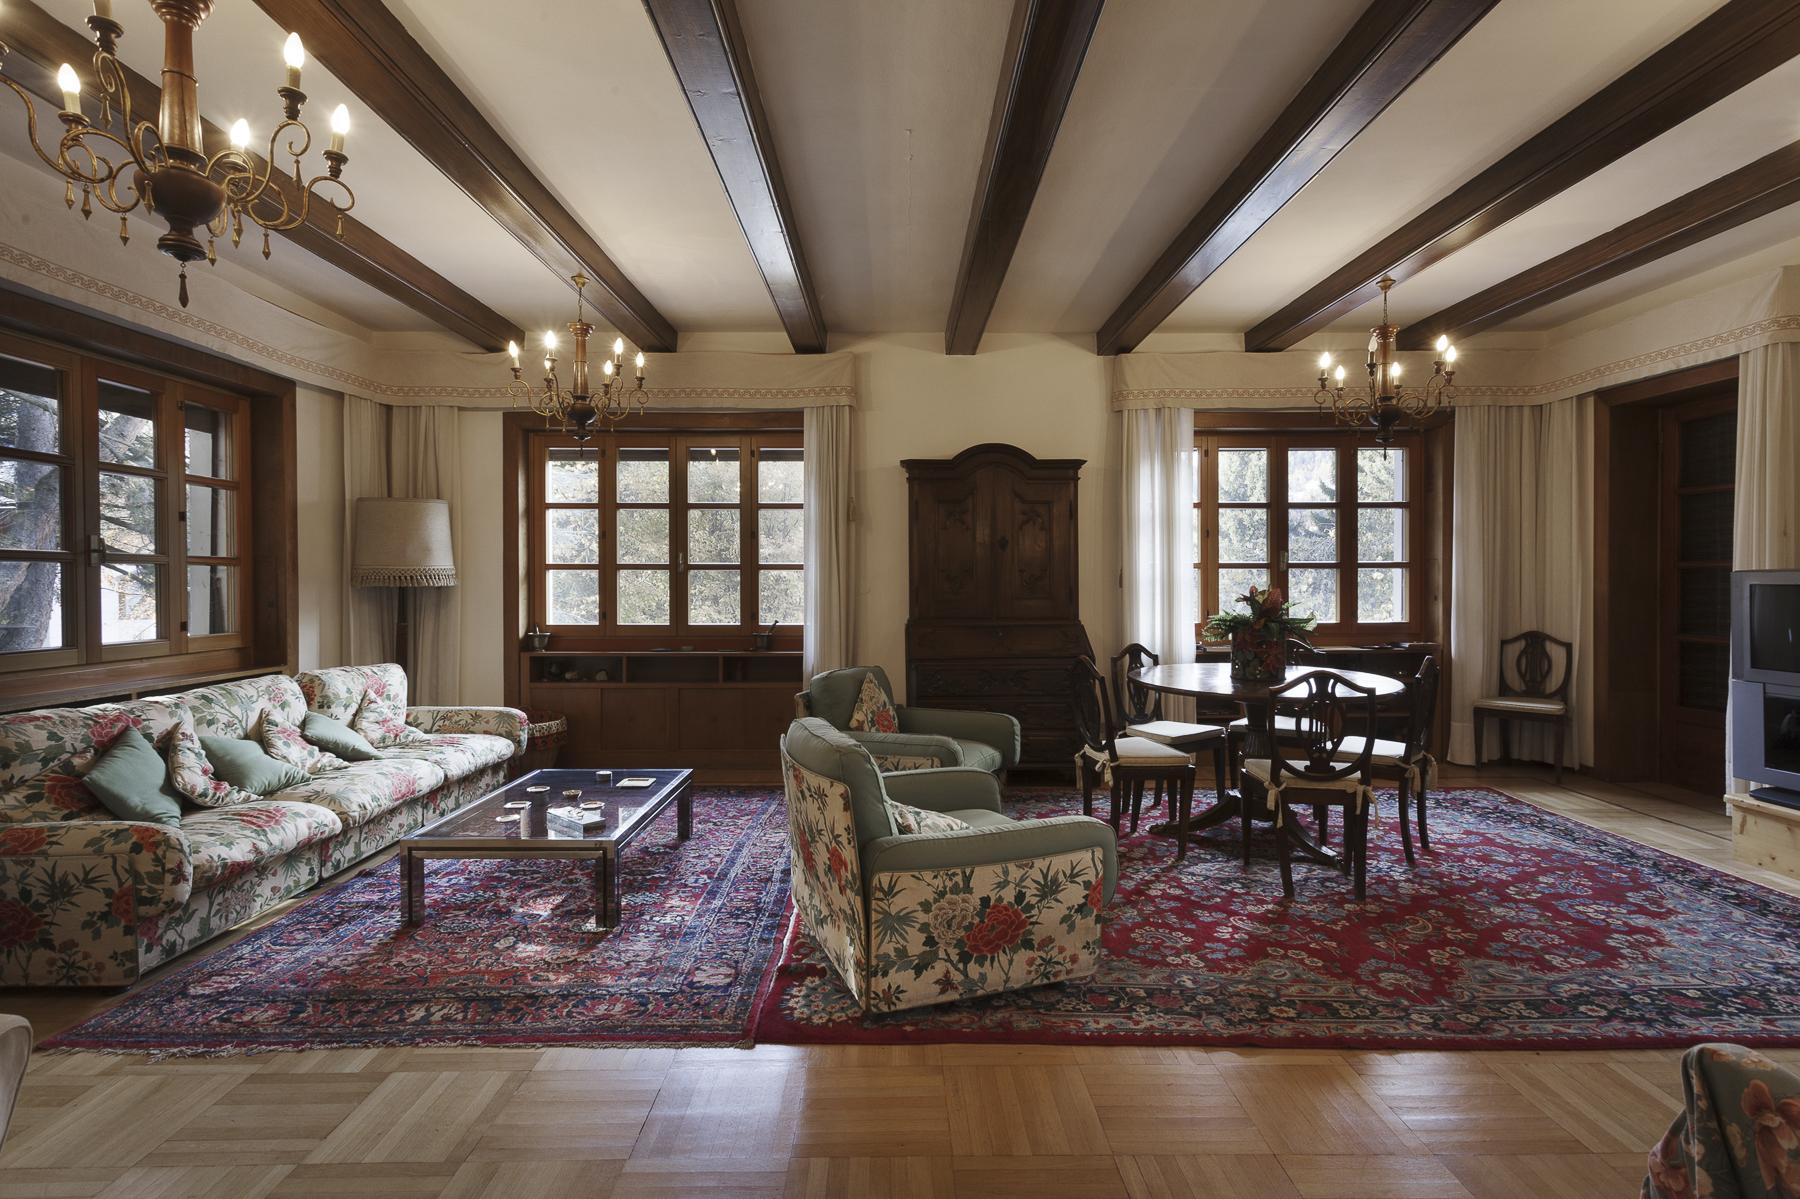 Villa in Vendita a Courmayeur: 5 locali, 1230 mq - Foto 7